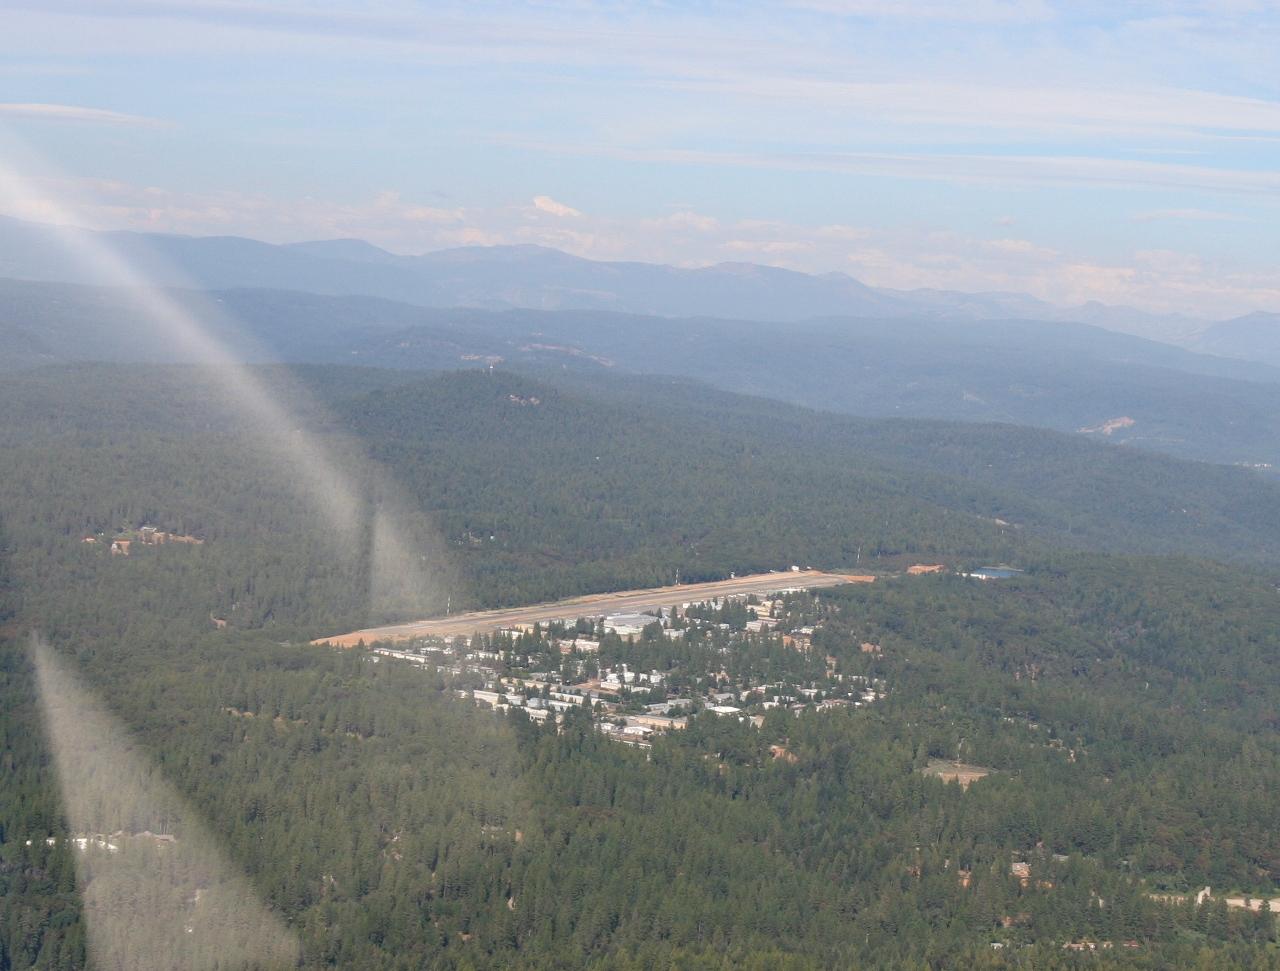 KGOO - Grass Valley Airport